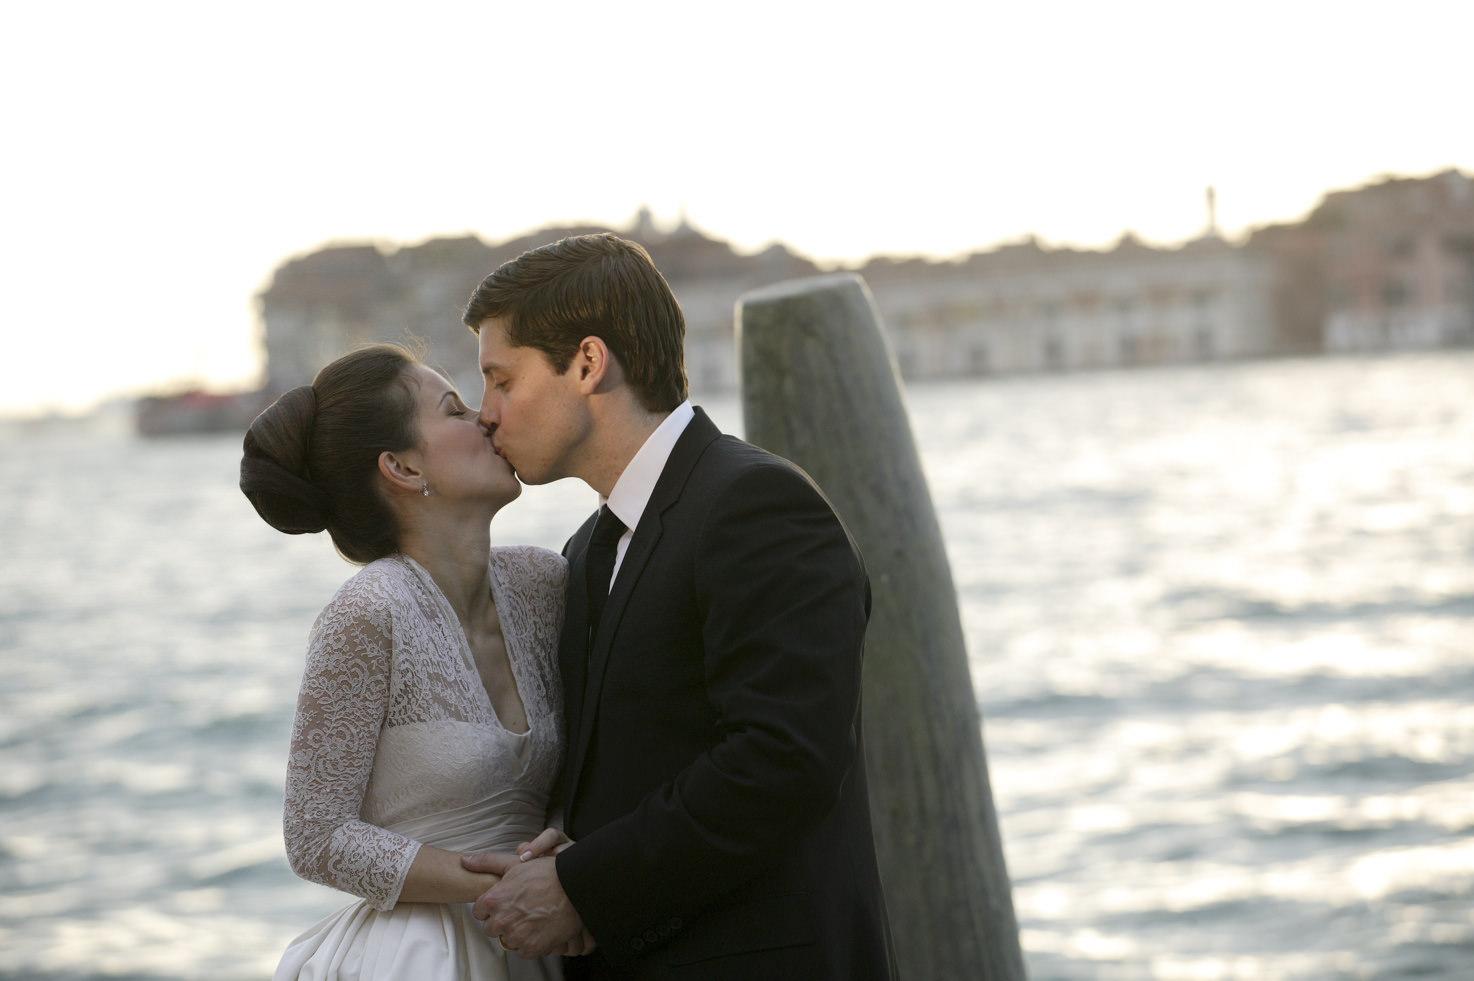 Destination wedding in Venice with jewish ceremony